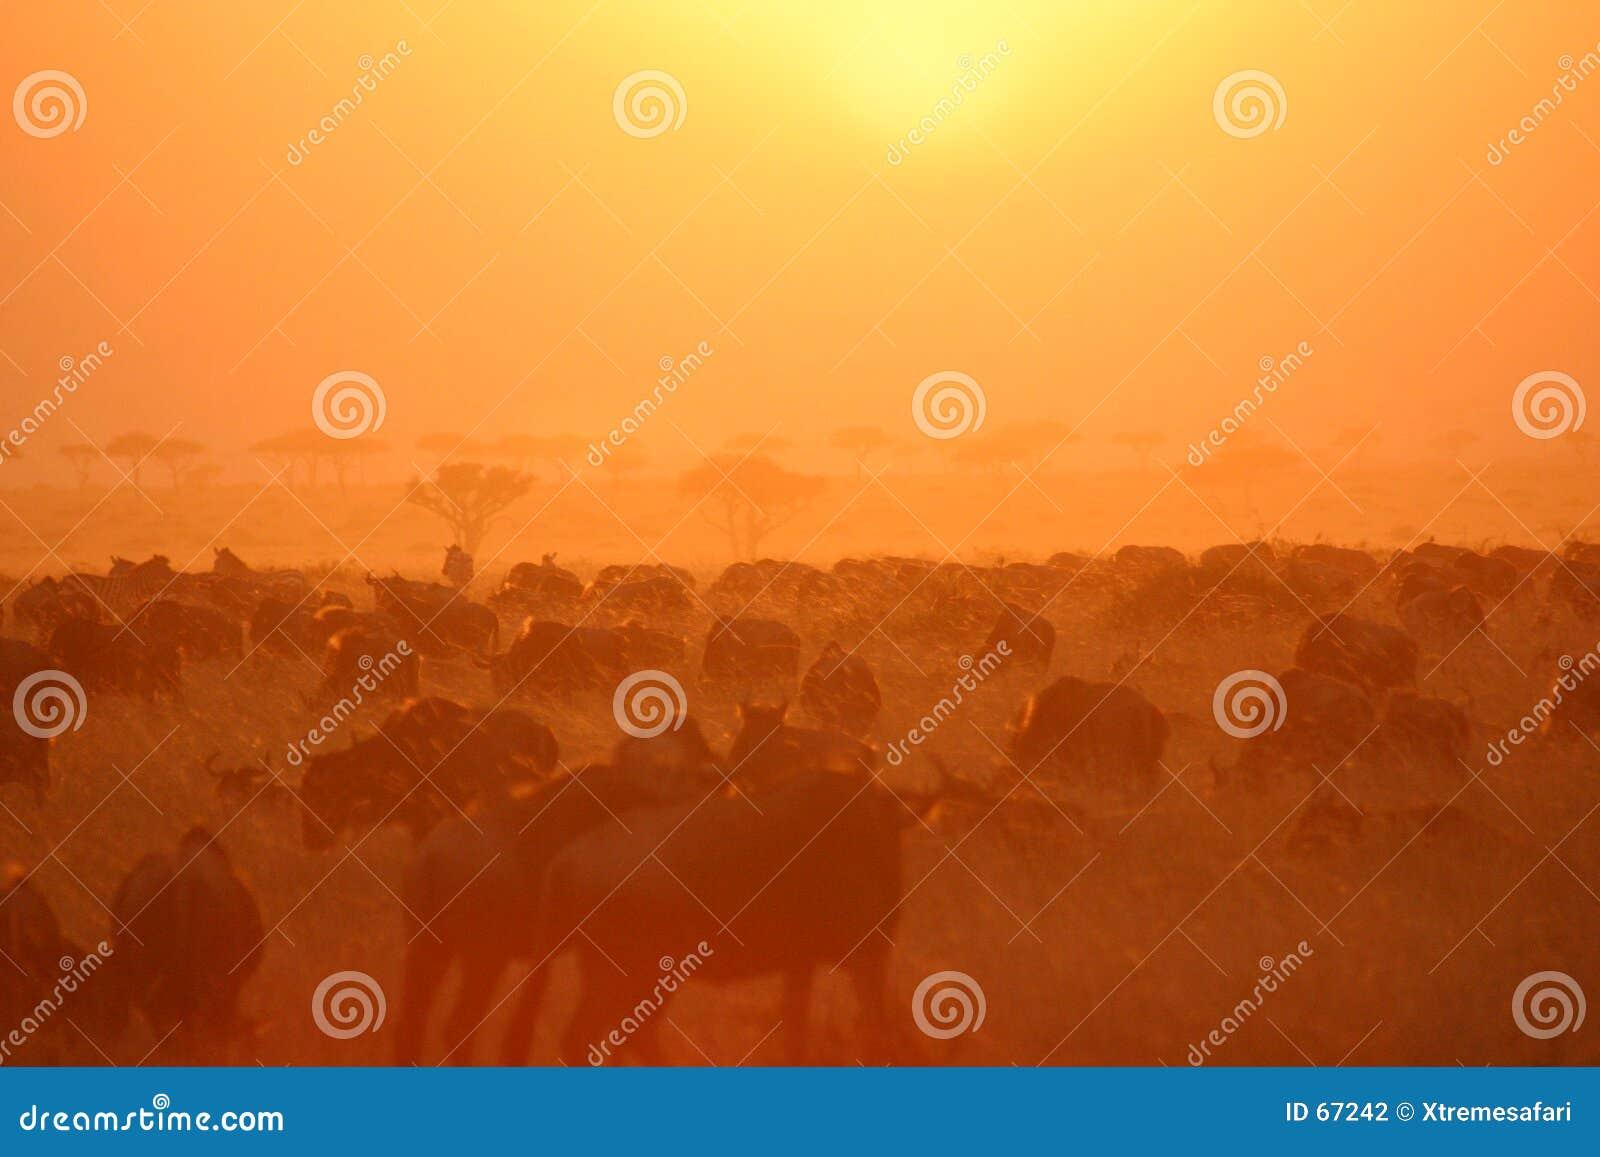 Migration sunset 6,04